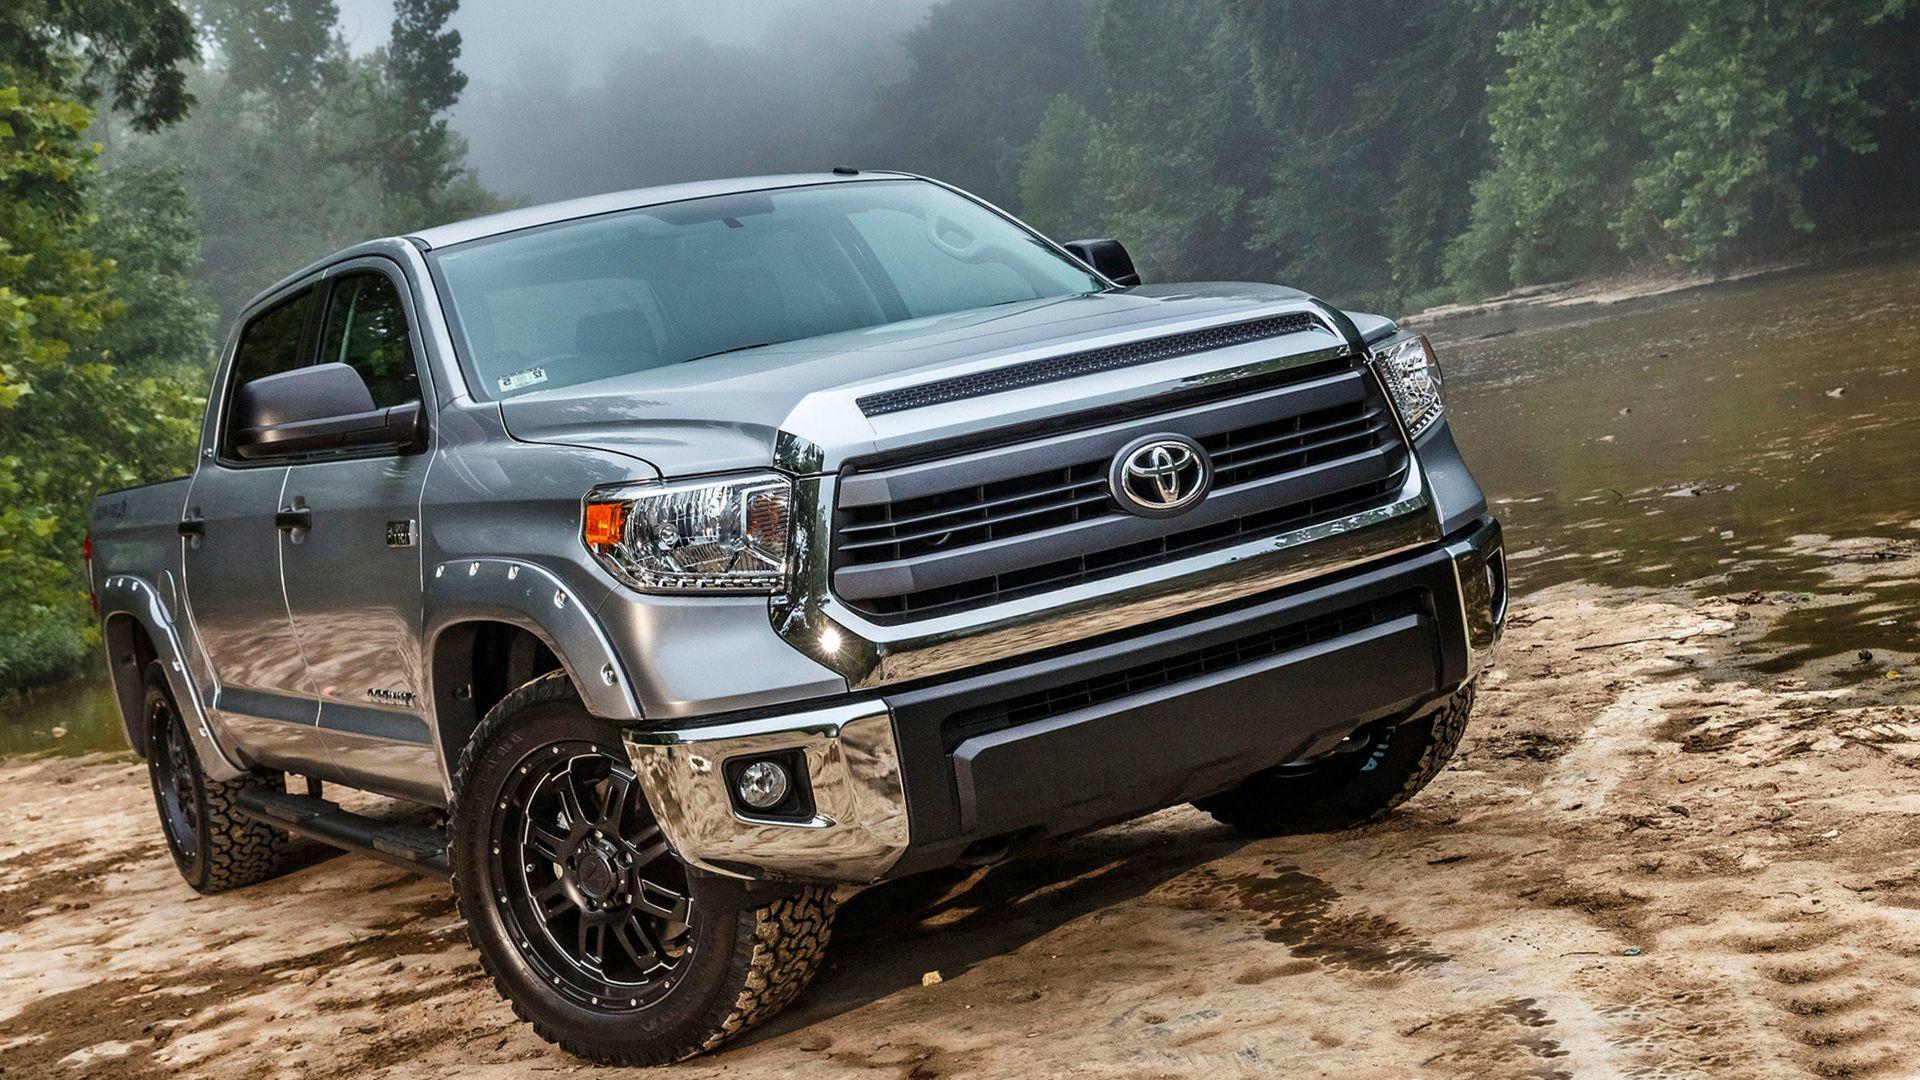 New 2019 Toyota Tundra Price Toyota car prices list